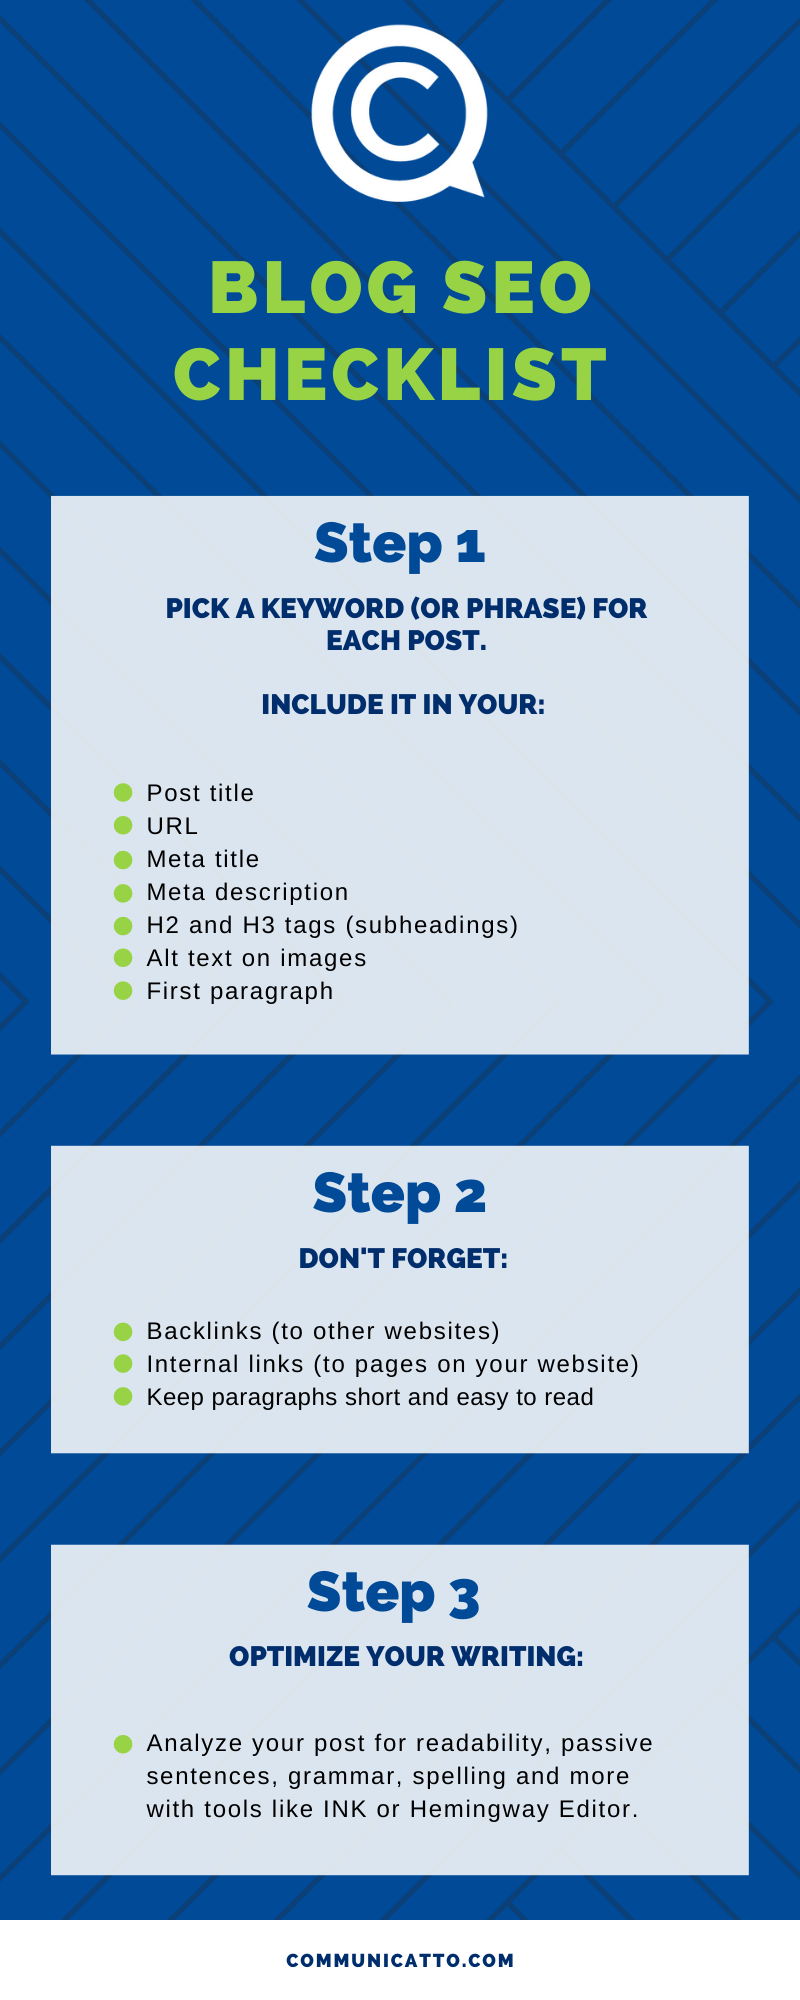 blog SEO checklist infographic